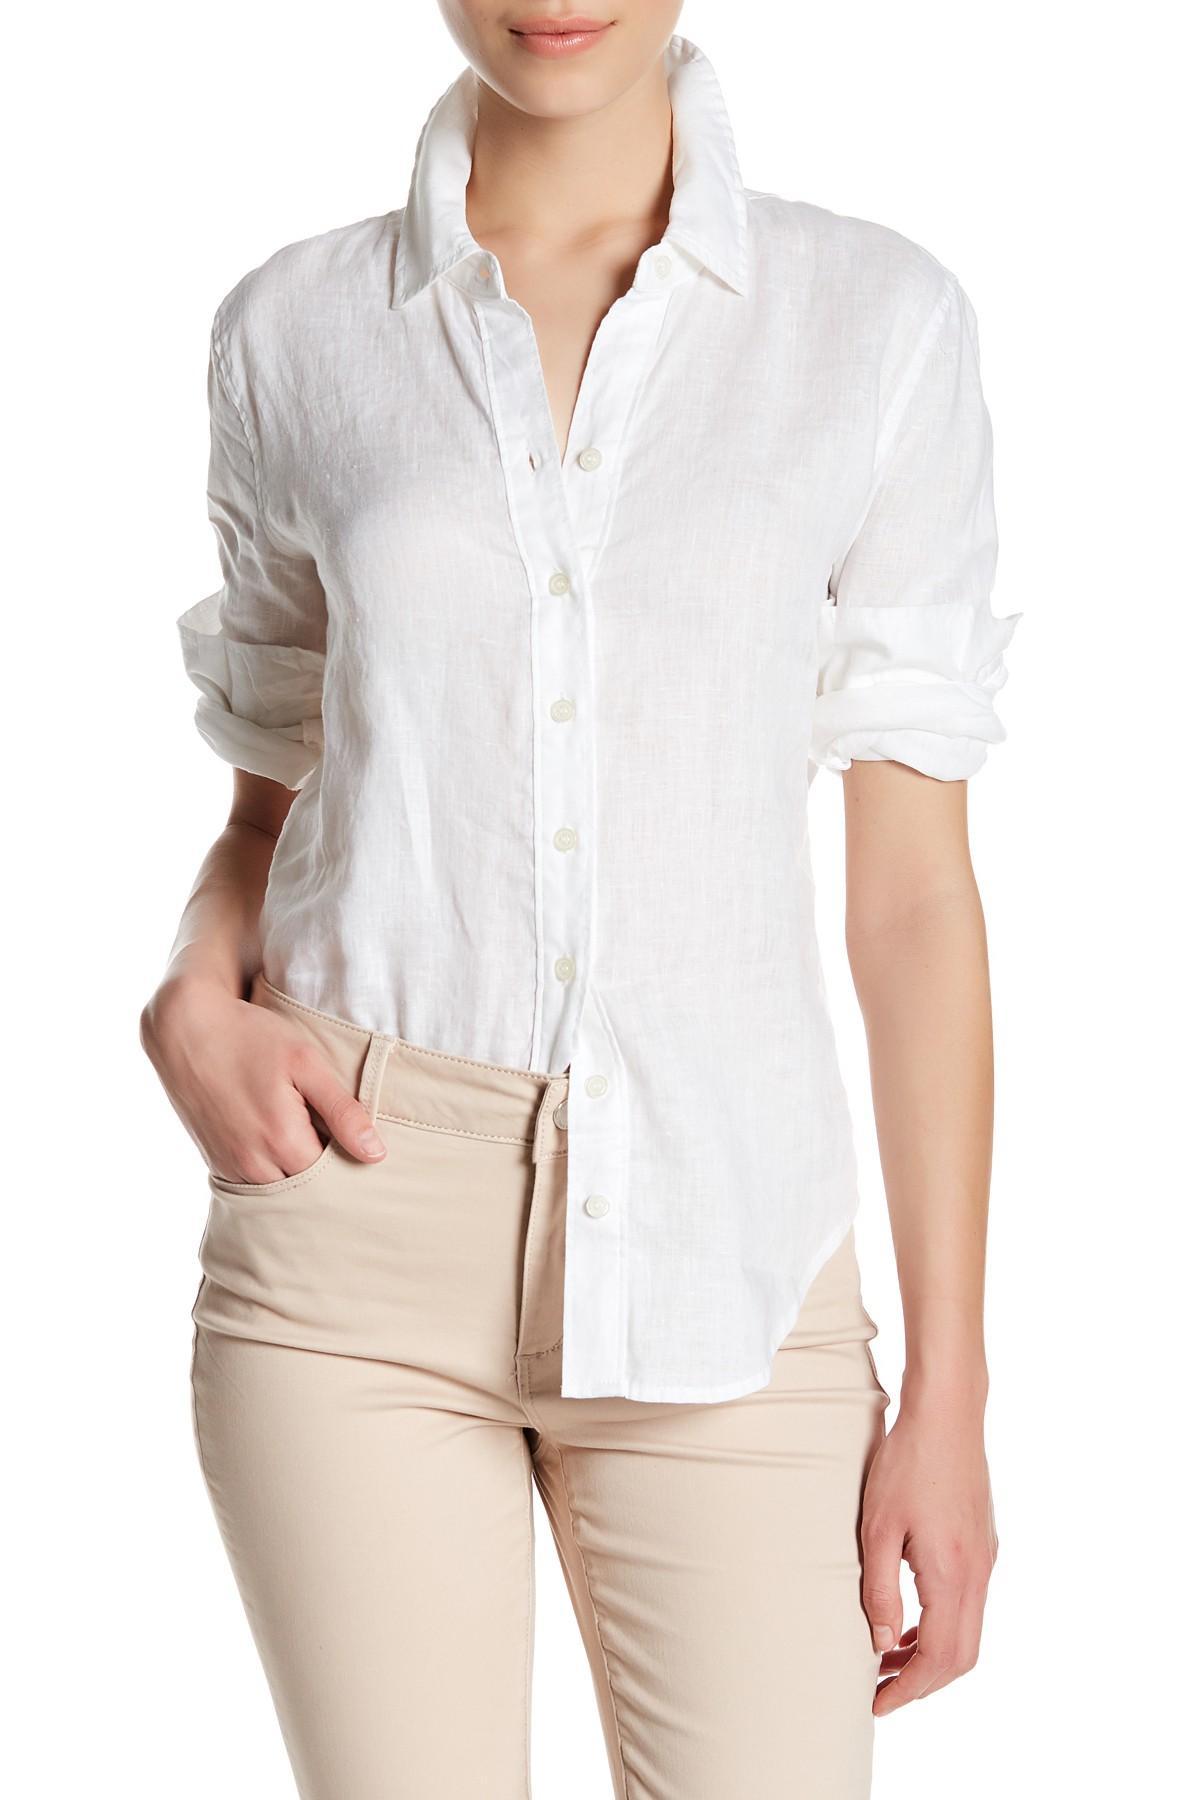 Lyst workshop long sleeve linen button up shirt petite for Long linen shirts for womens